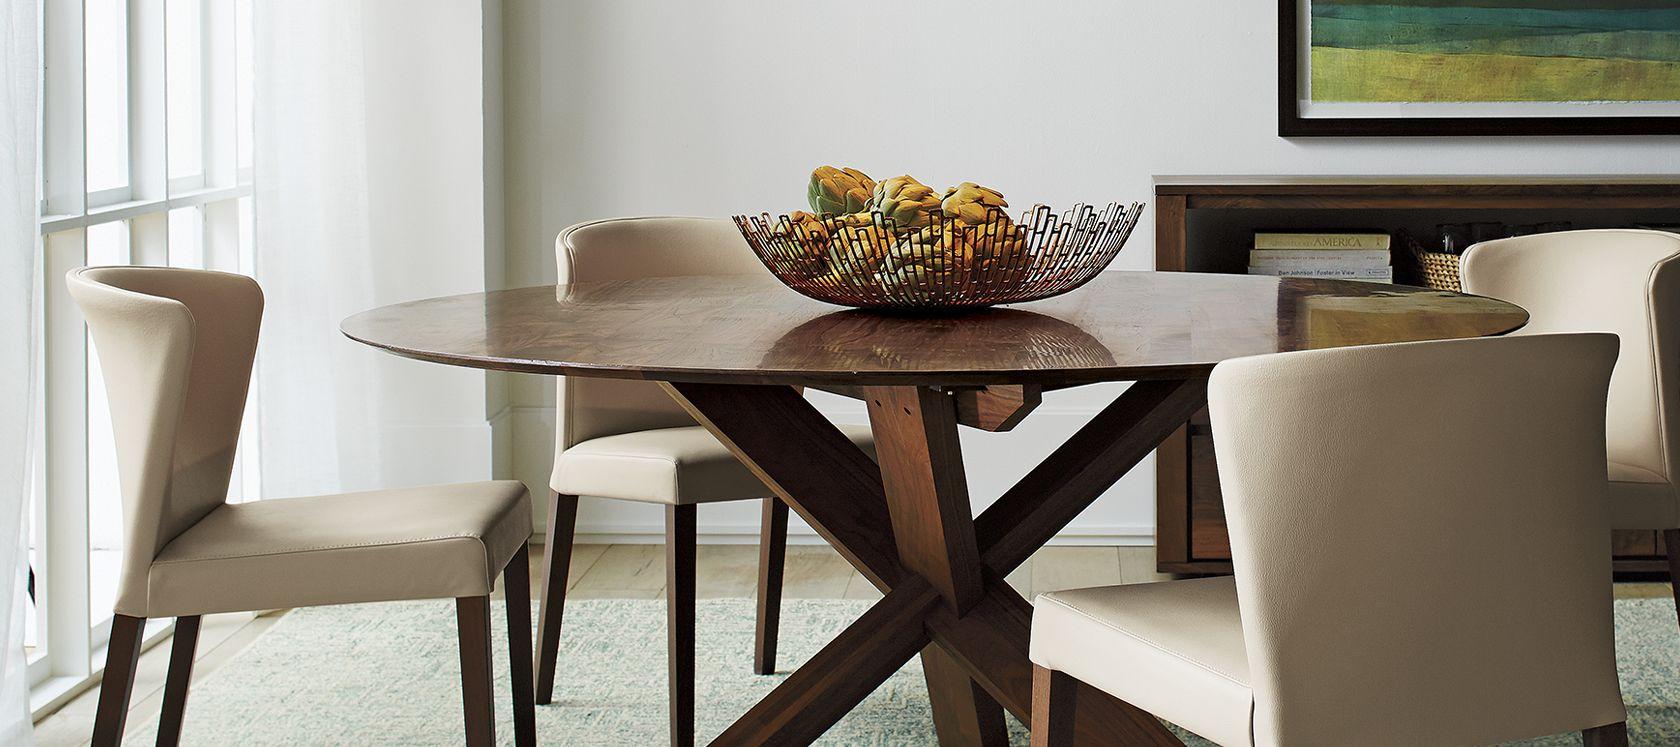 Kitchen Furnitures List   Dining Room Bar Kitchen Furniture Crate And Barrel